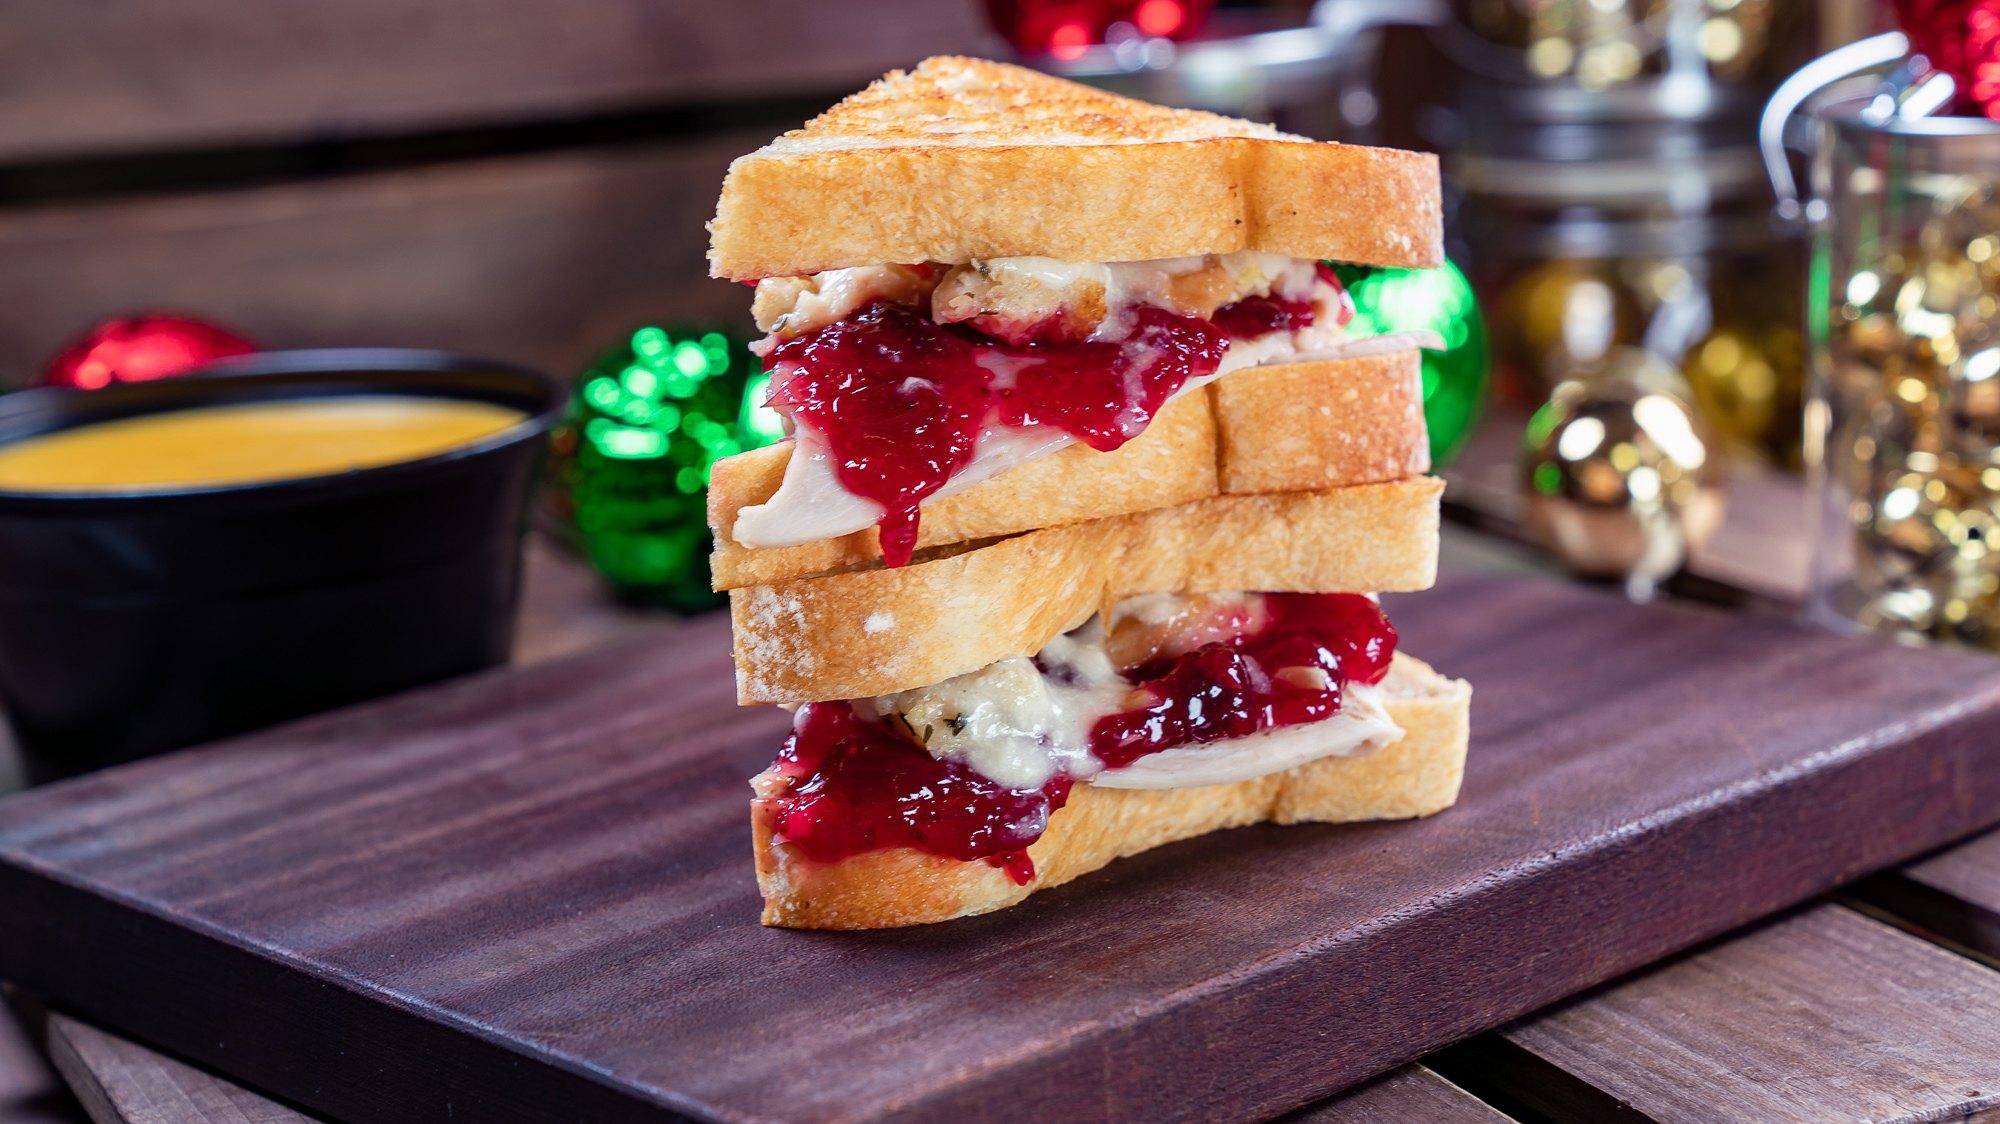 The Thanks-Mas holiday sandwich at Disneyland